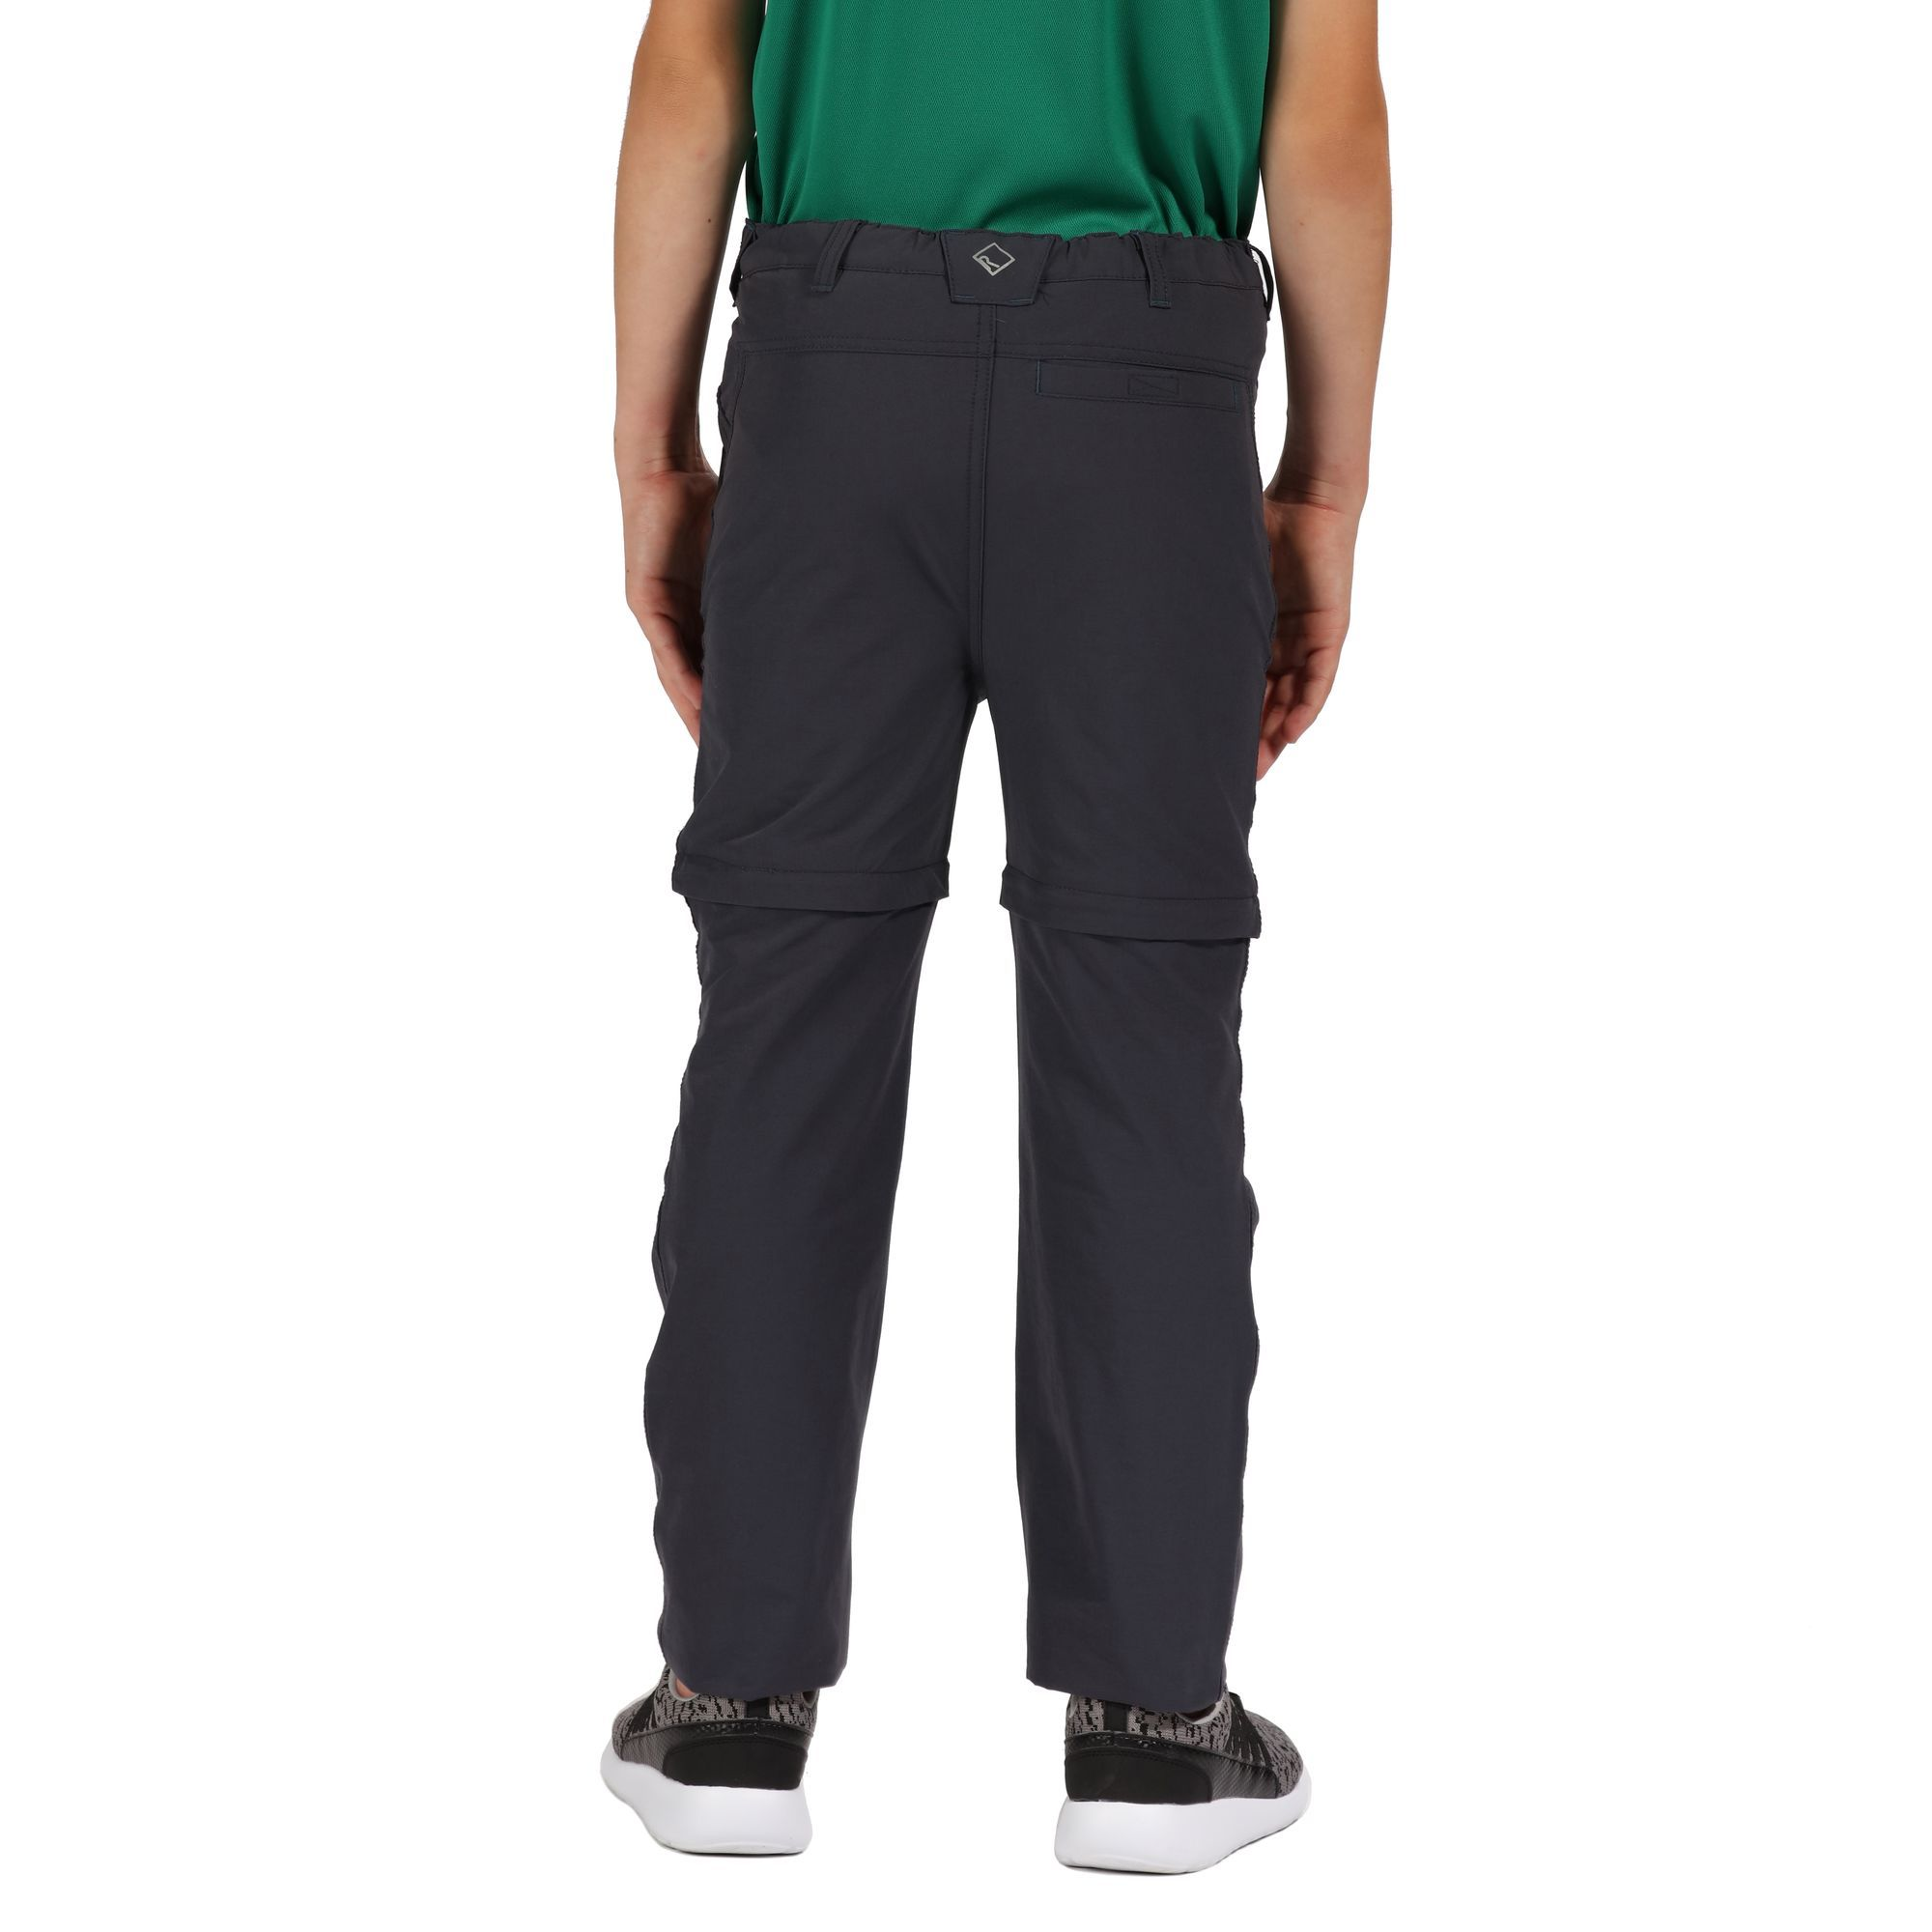 Regatta Childrens/Kids Hikefell Stretch Zip Off Trousers